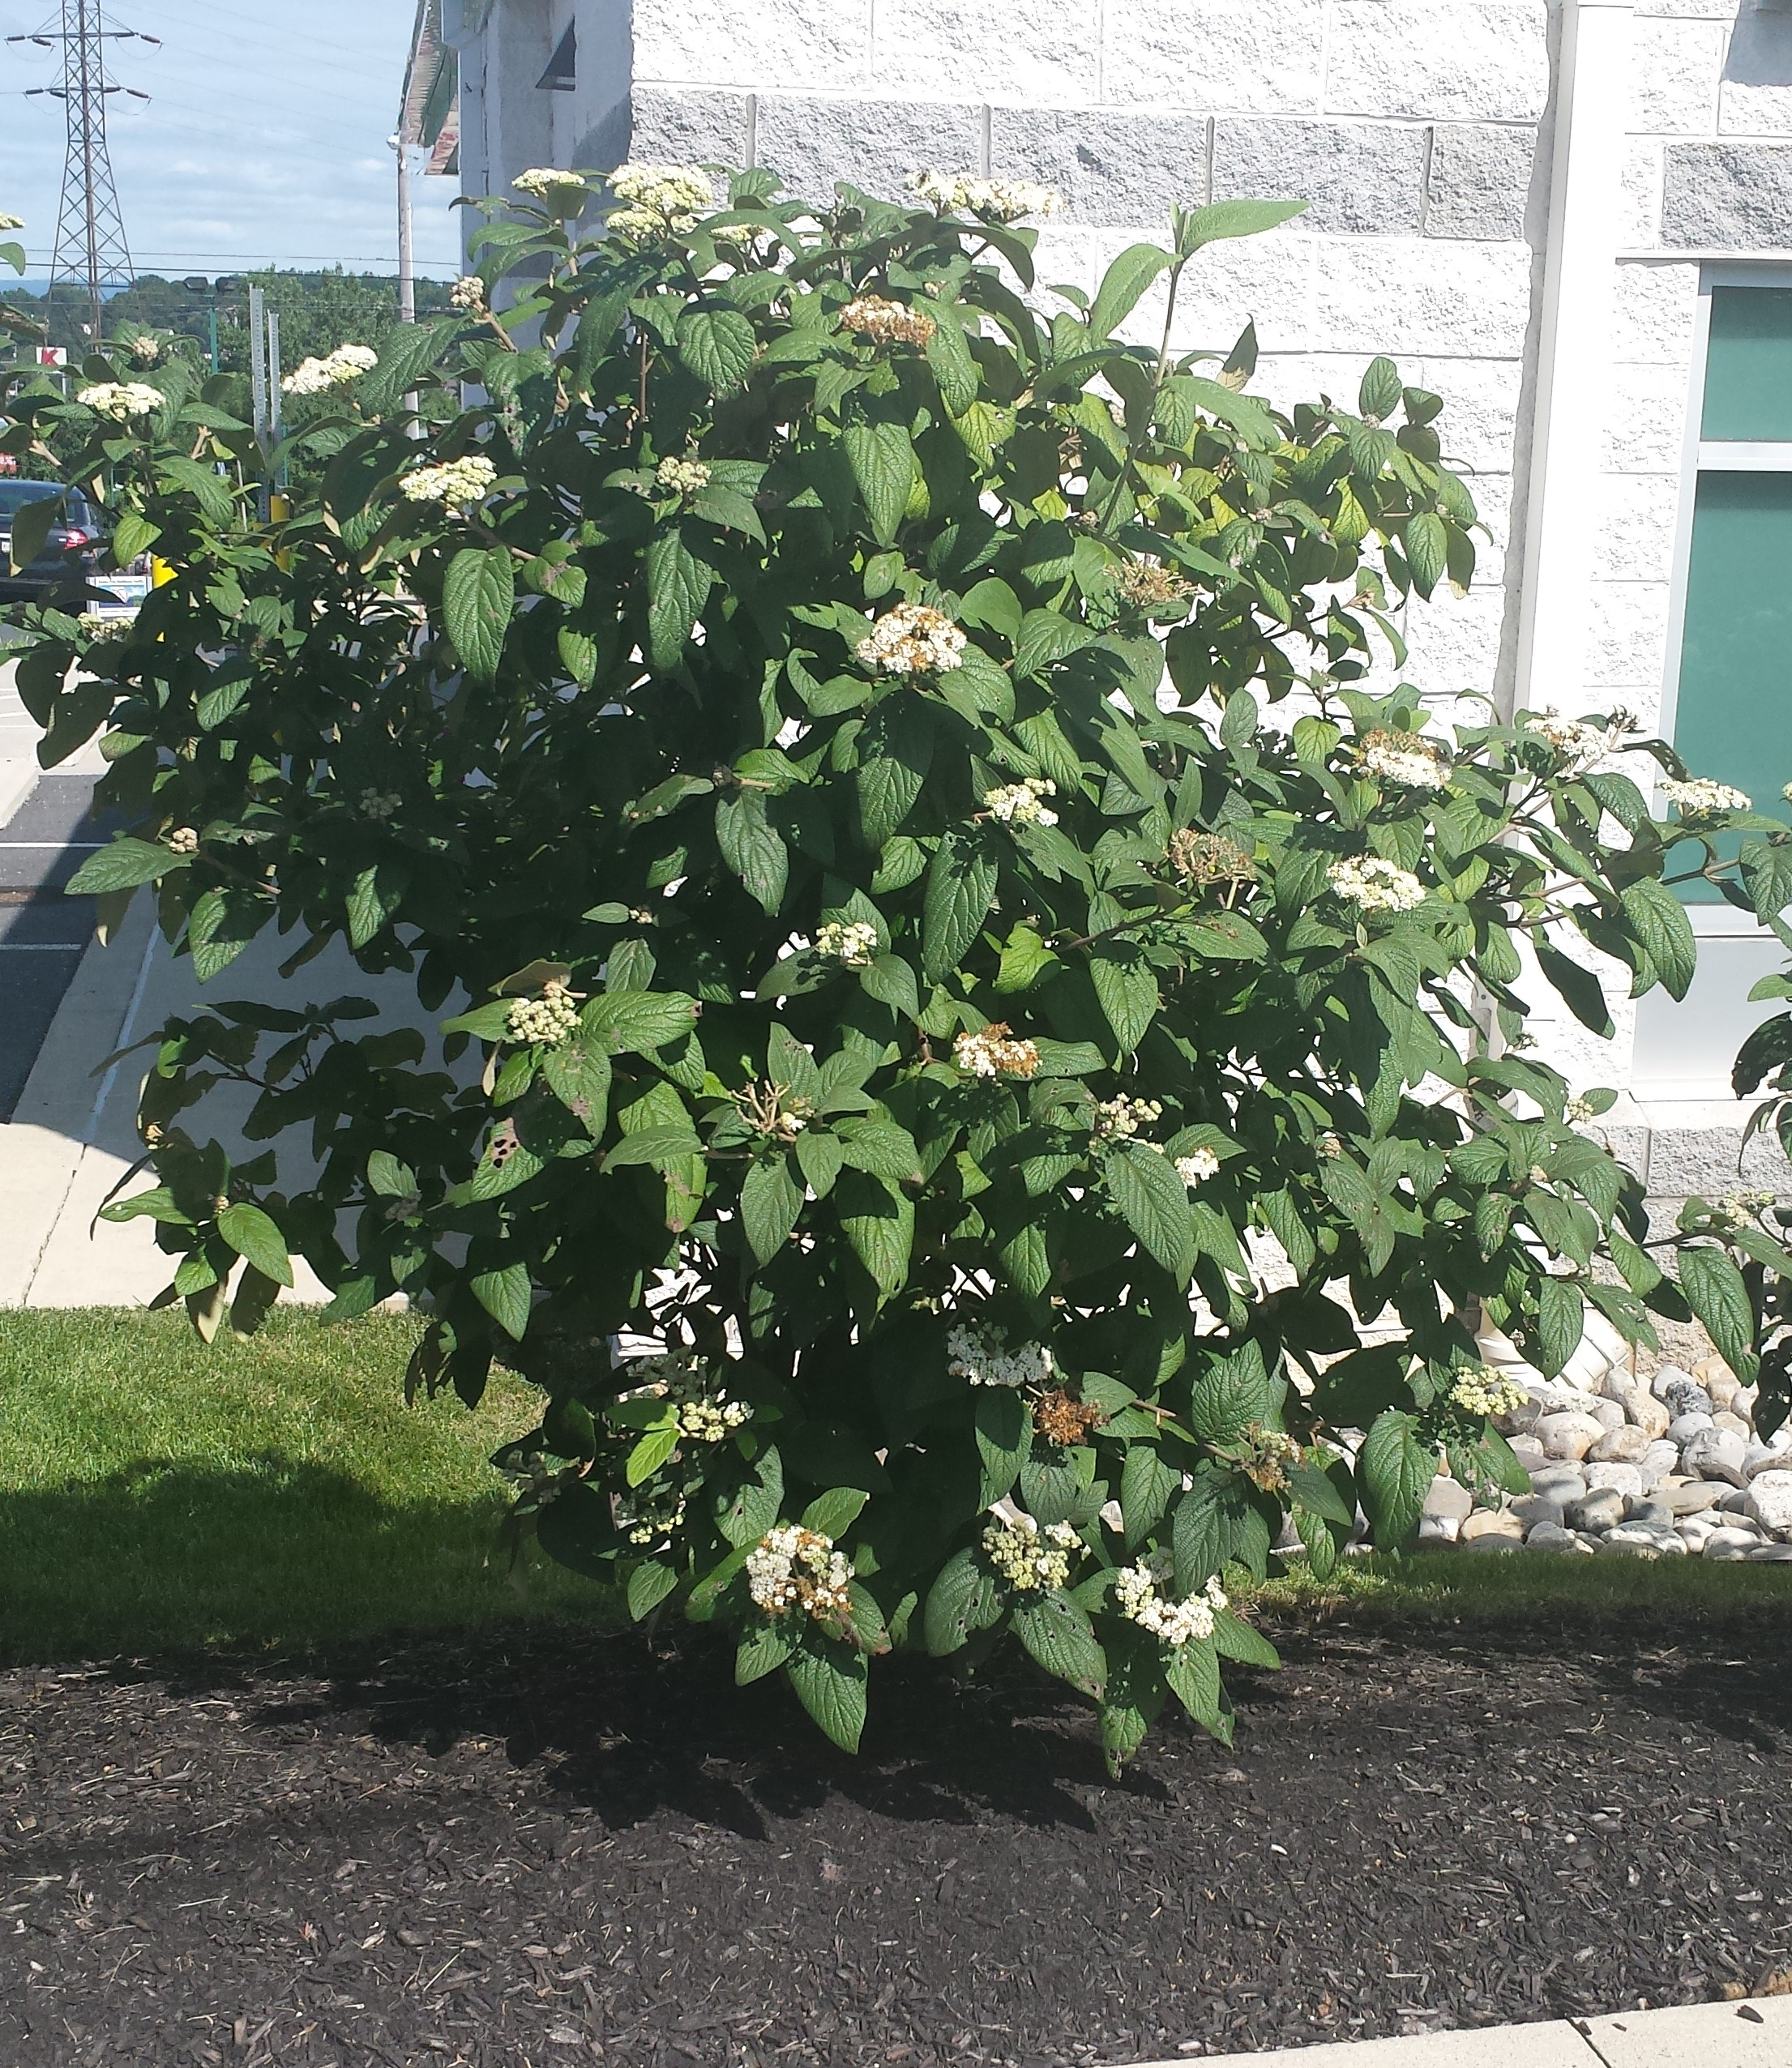 PLANT SPOTLIGHT: Viburnum